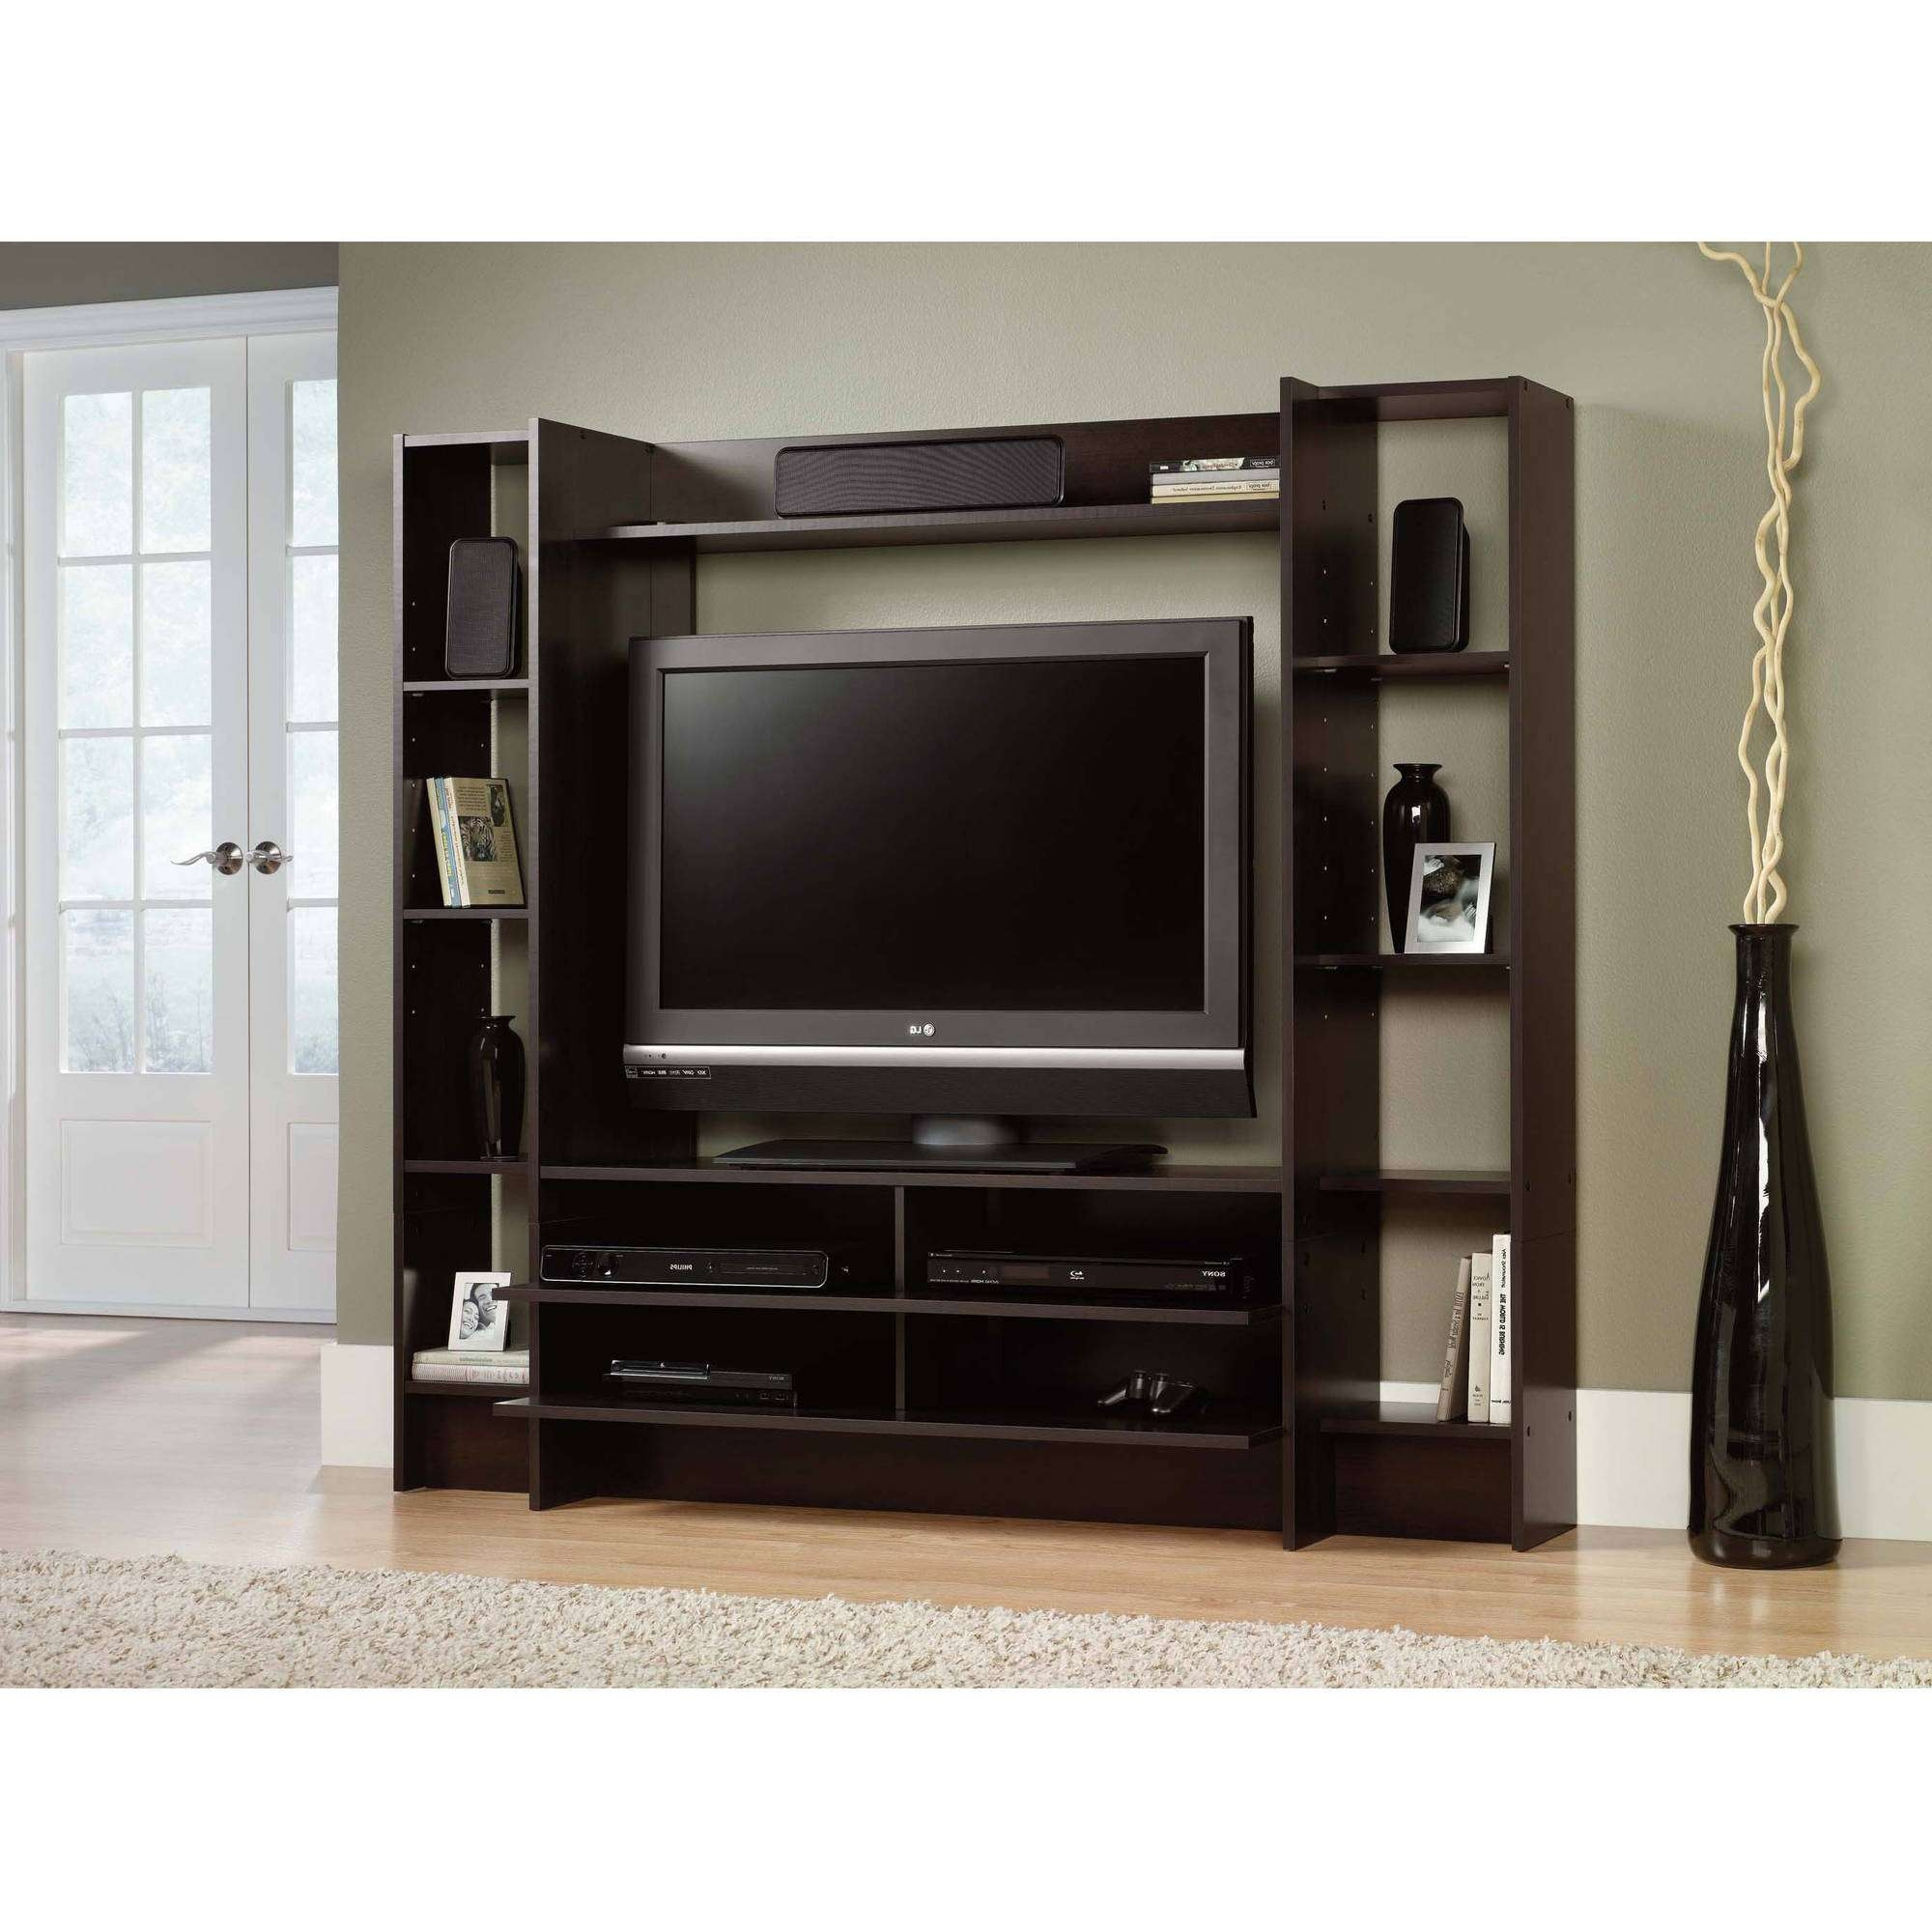 Tv Stands & Entertainment Centers – Walmart Inside Entertainment Center Tv Stands (View 8 of 15)